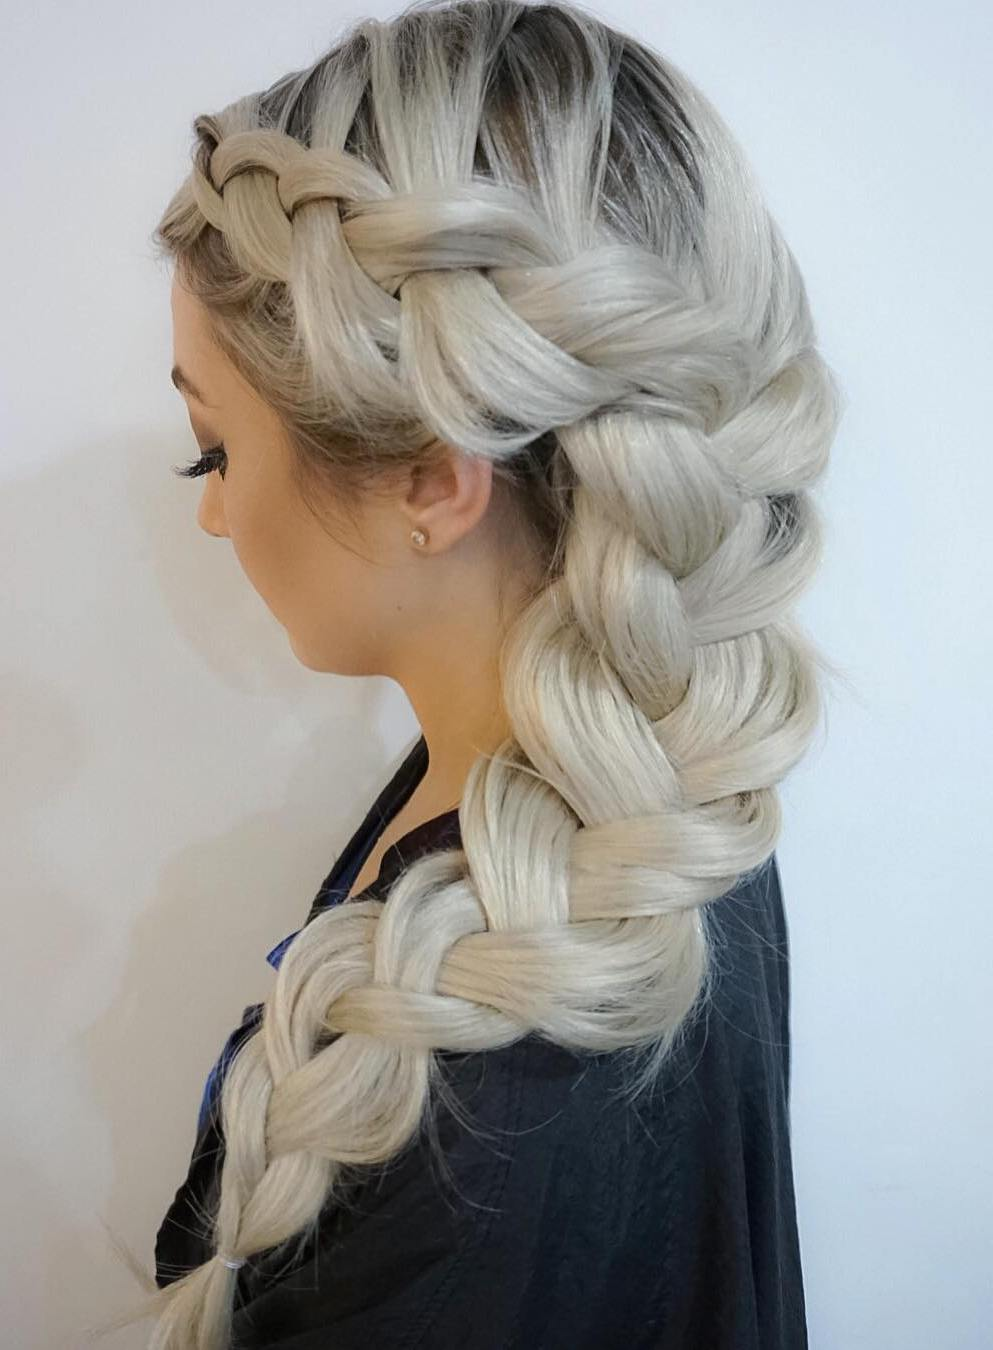 Hairstyle Ideas for Straight Hair | 2019 Haircuts ...